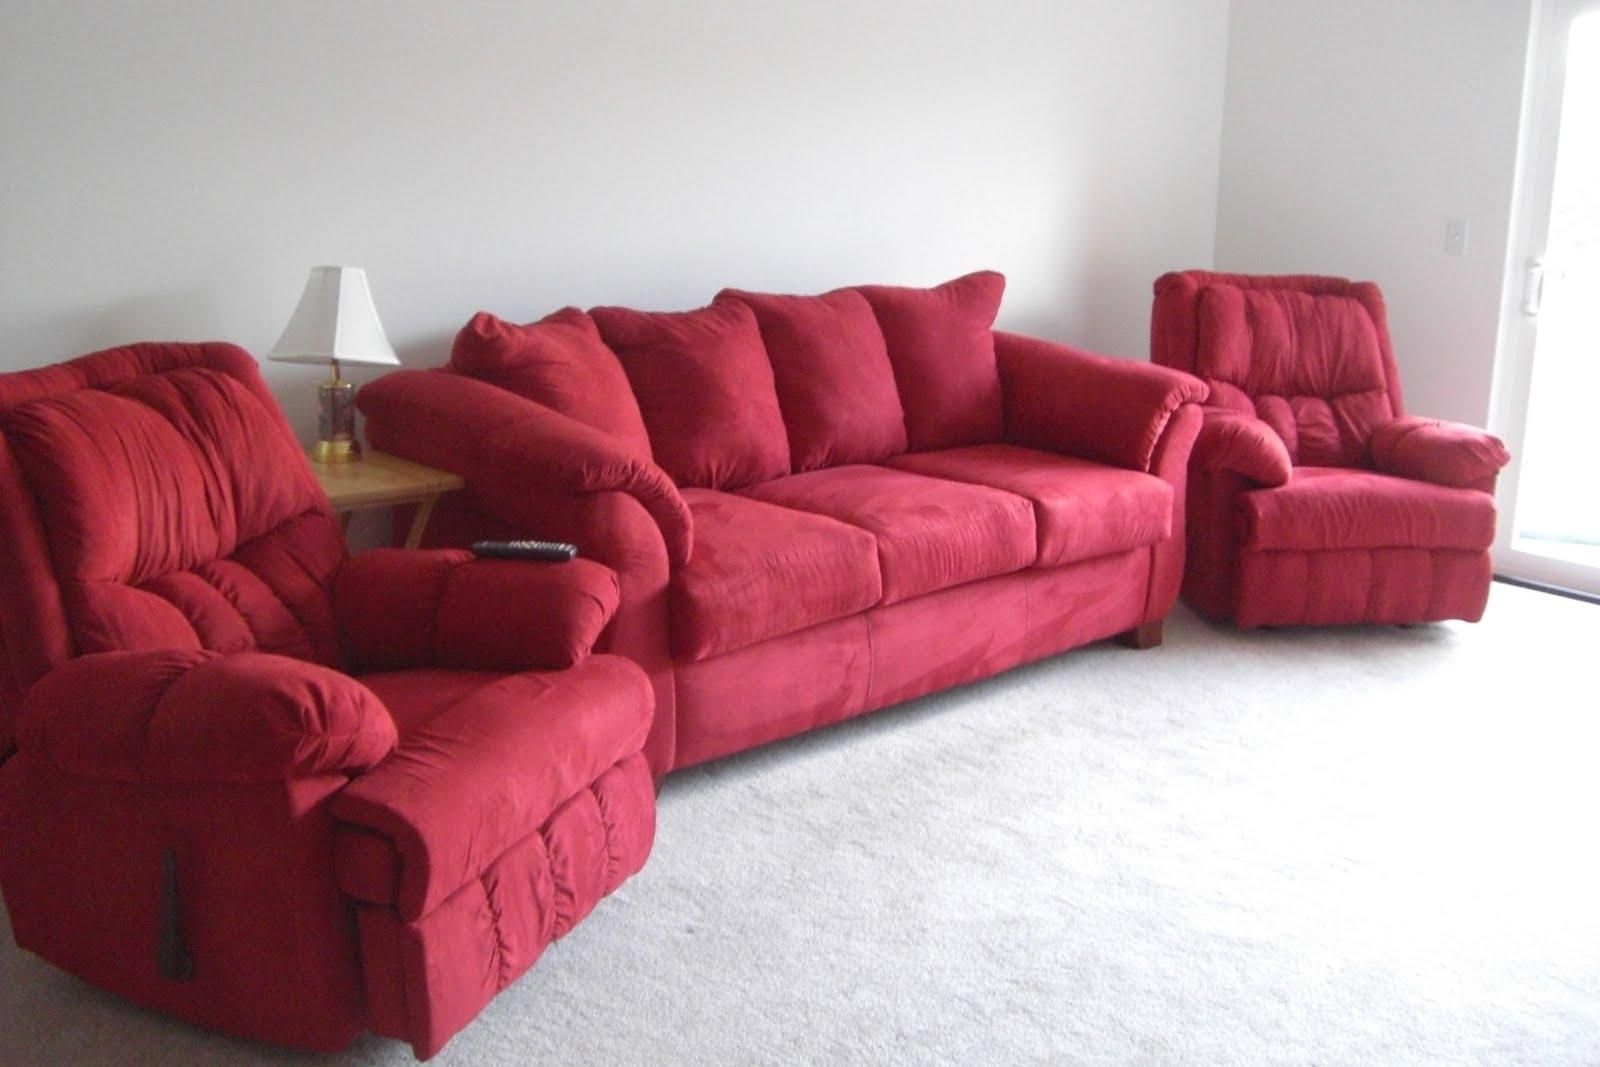 what is a sleeper sofa in hotel leder fur esstisch lemoyne badcock furniture